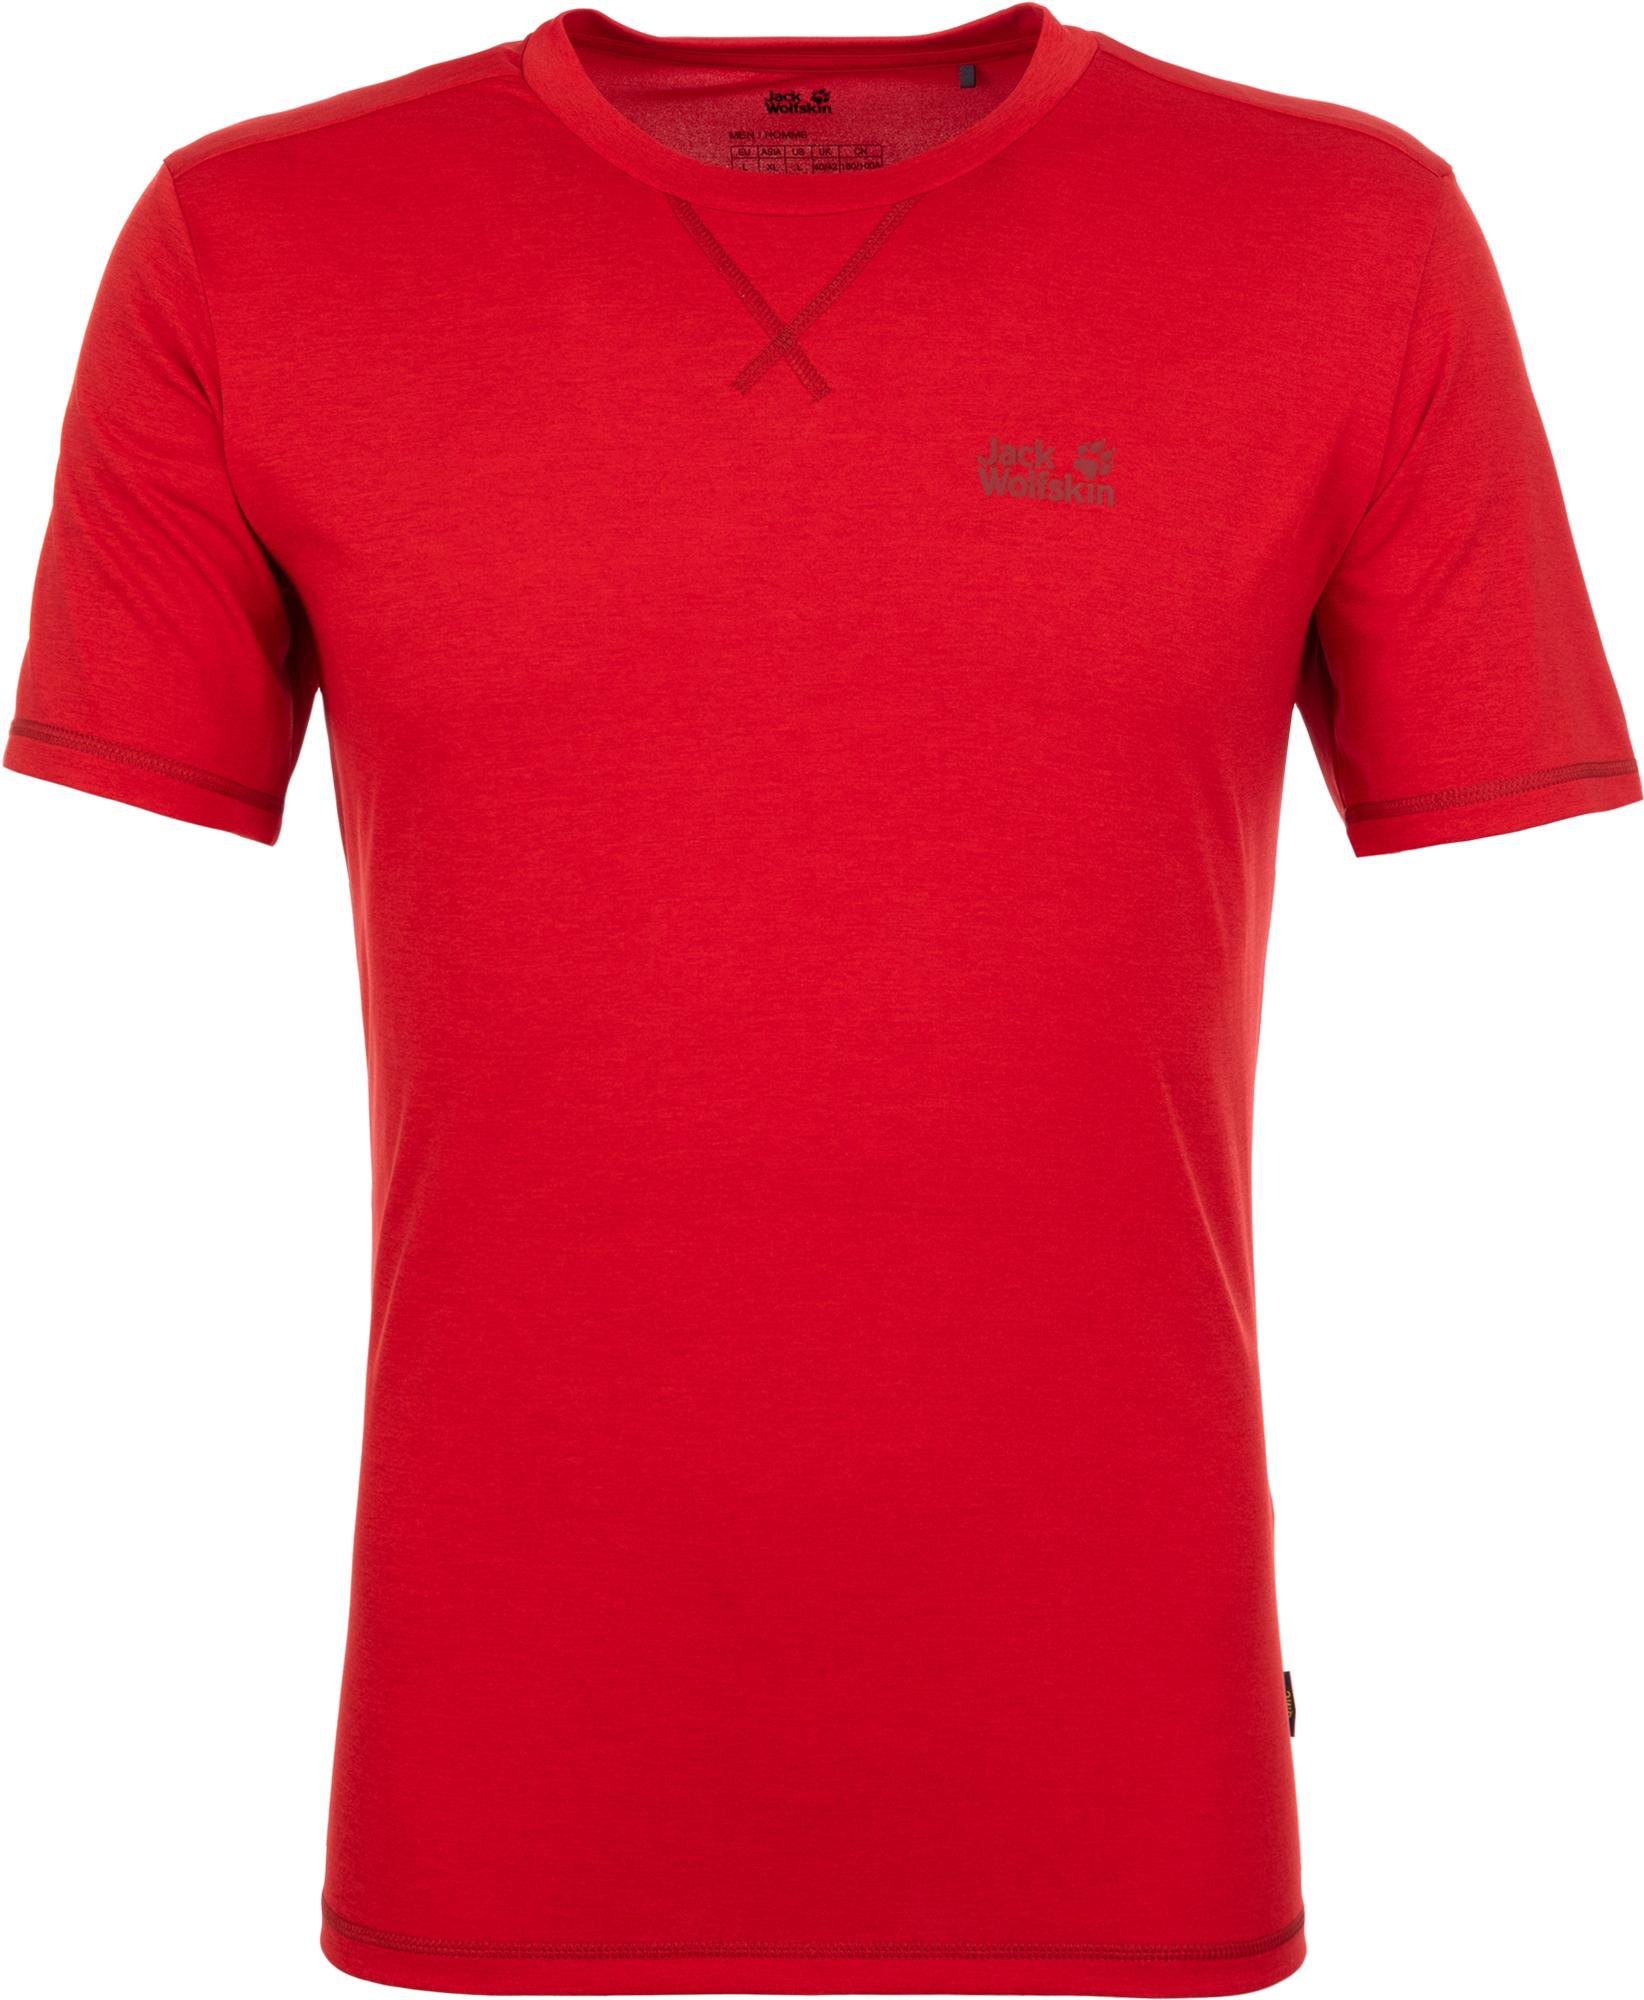 Jack Wolfskin Футболка мужская JACK WOLFSKIN Crosstrail, размер 46-48 футболка для мальчика jack wolfskin brand t boys цвет темно голубой 1607241 1087 размер 176 182